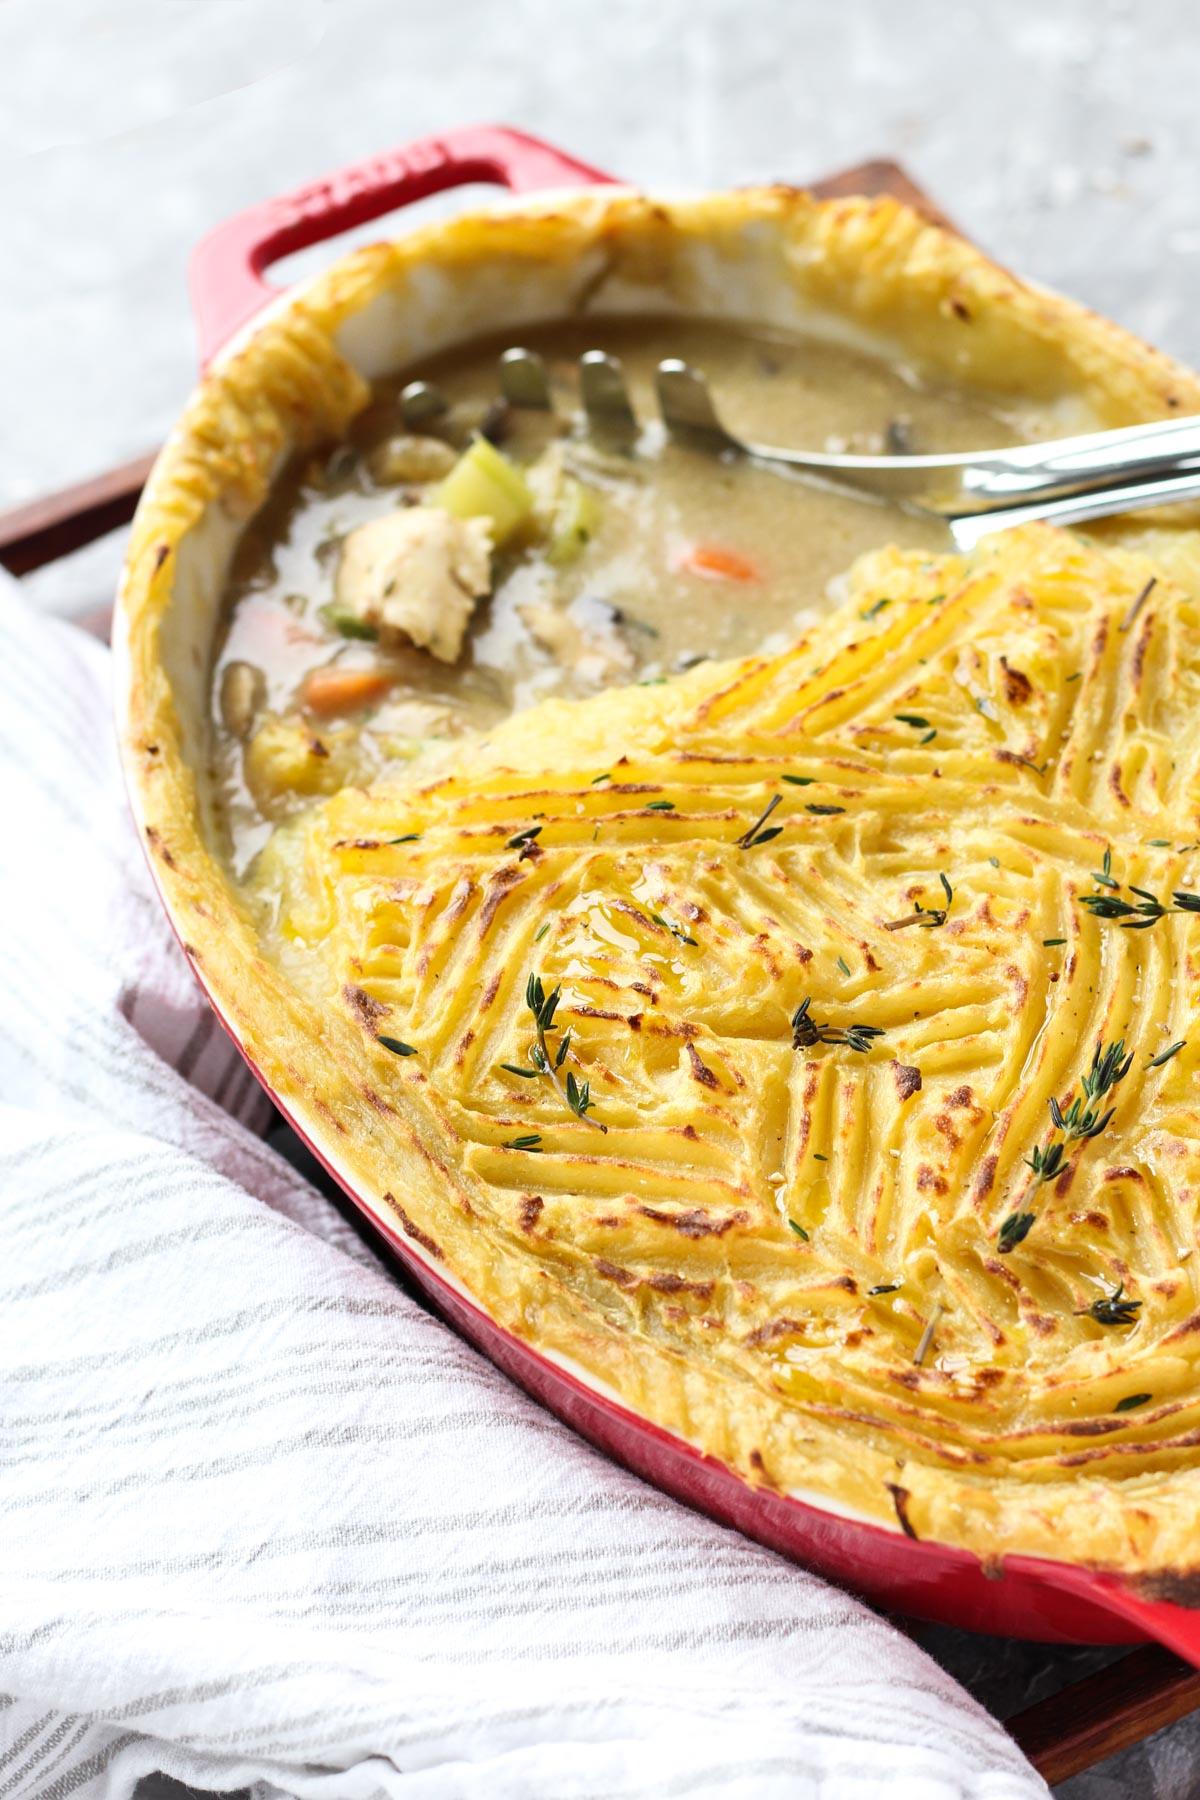 Scoop leaning on casserole dish.